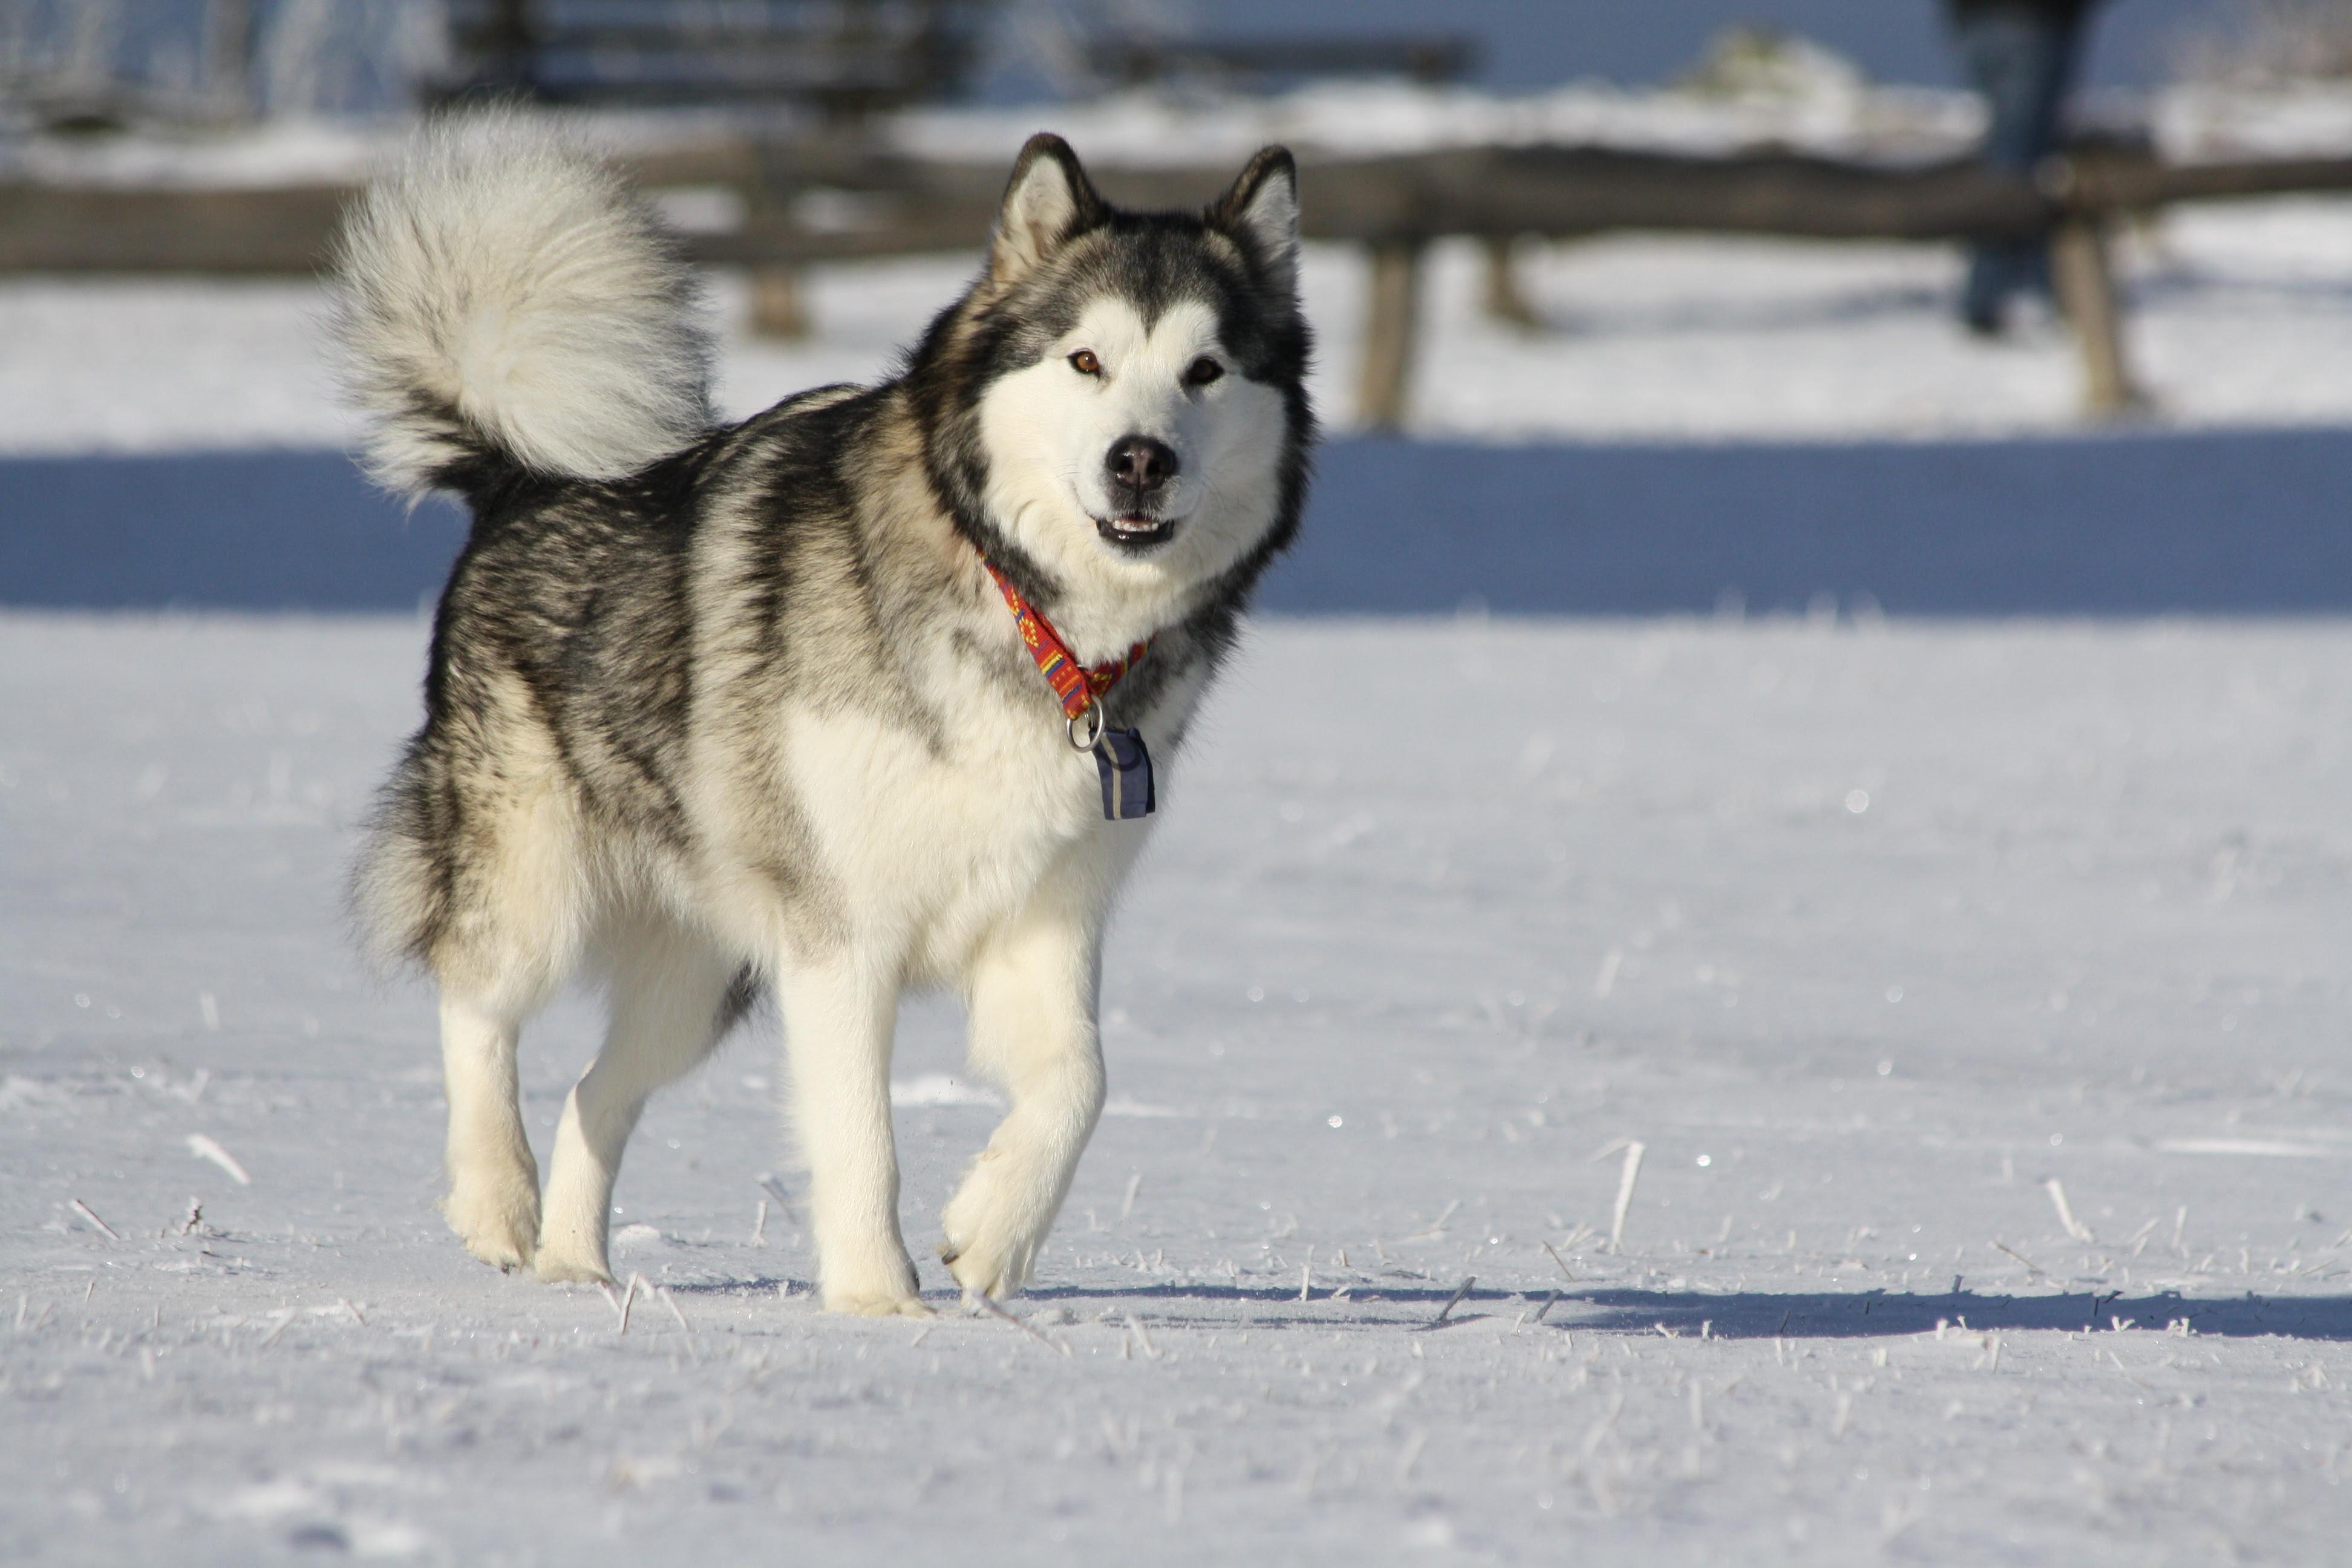 ALL BREEDS DOGS: Alaskan Malamute dog